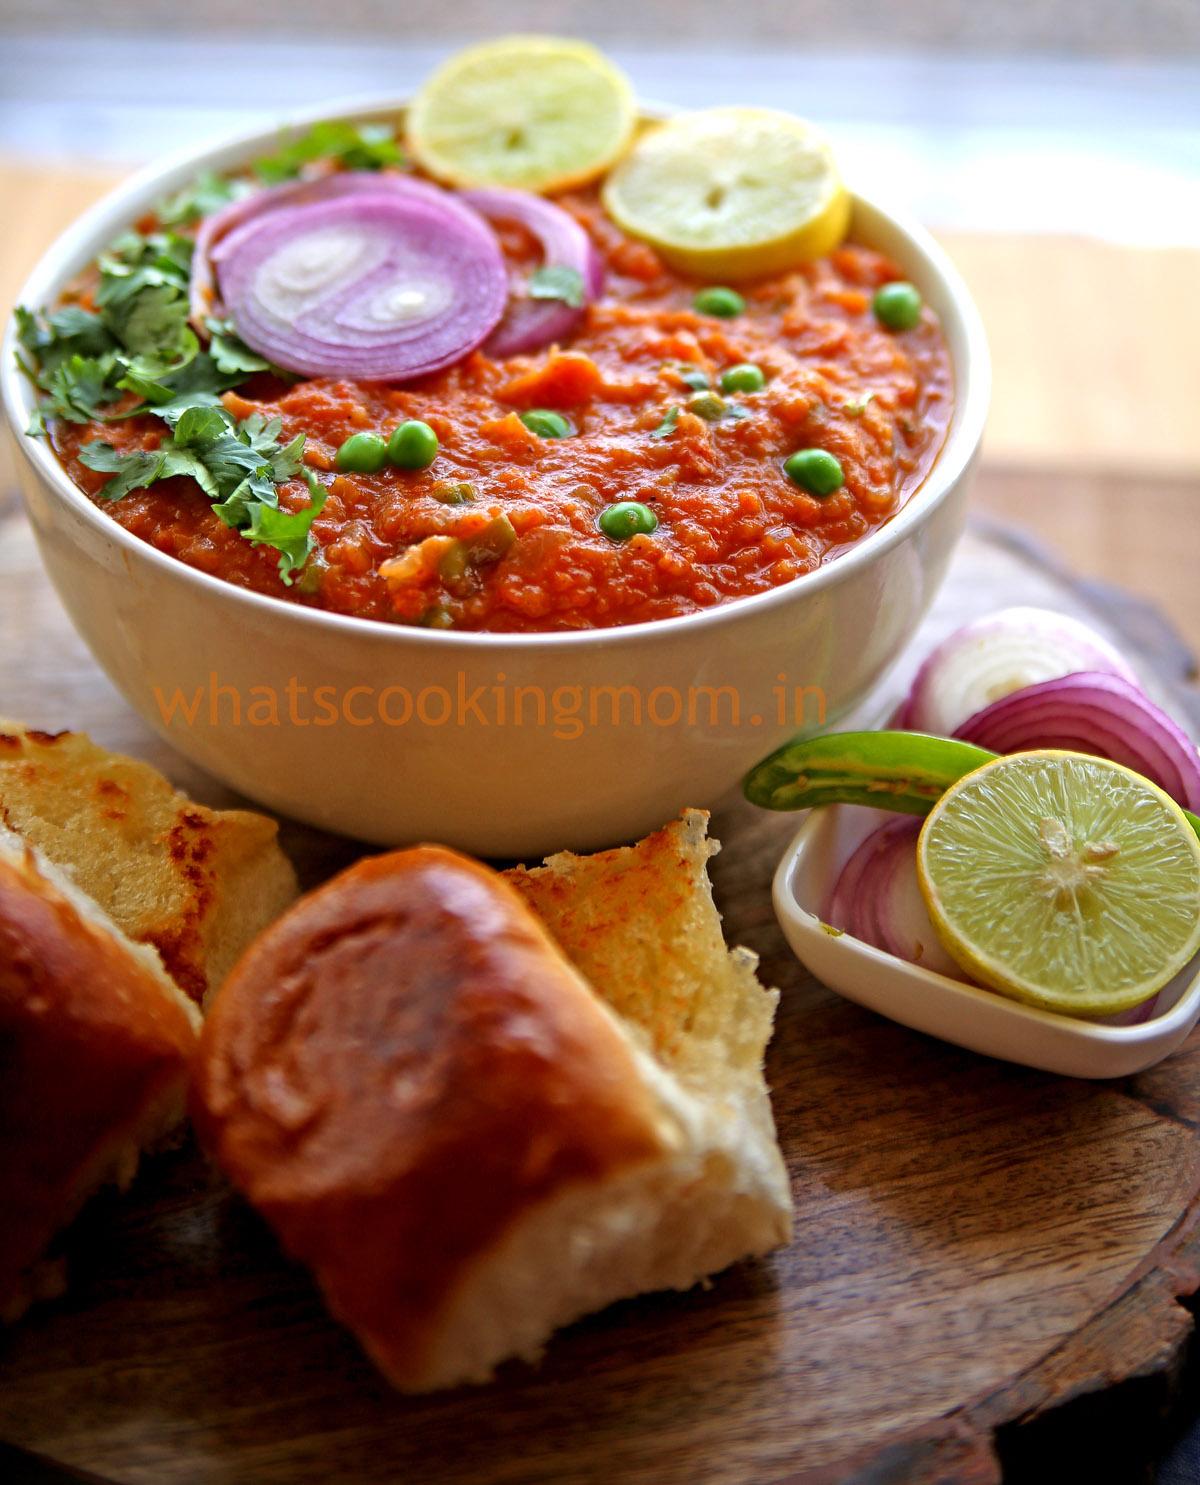 Pav Bhaji - Vegetarian Indian Street food from Mumbai made with mixed vegetables and potatoes